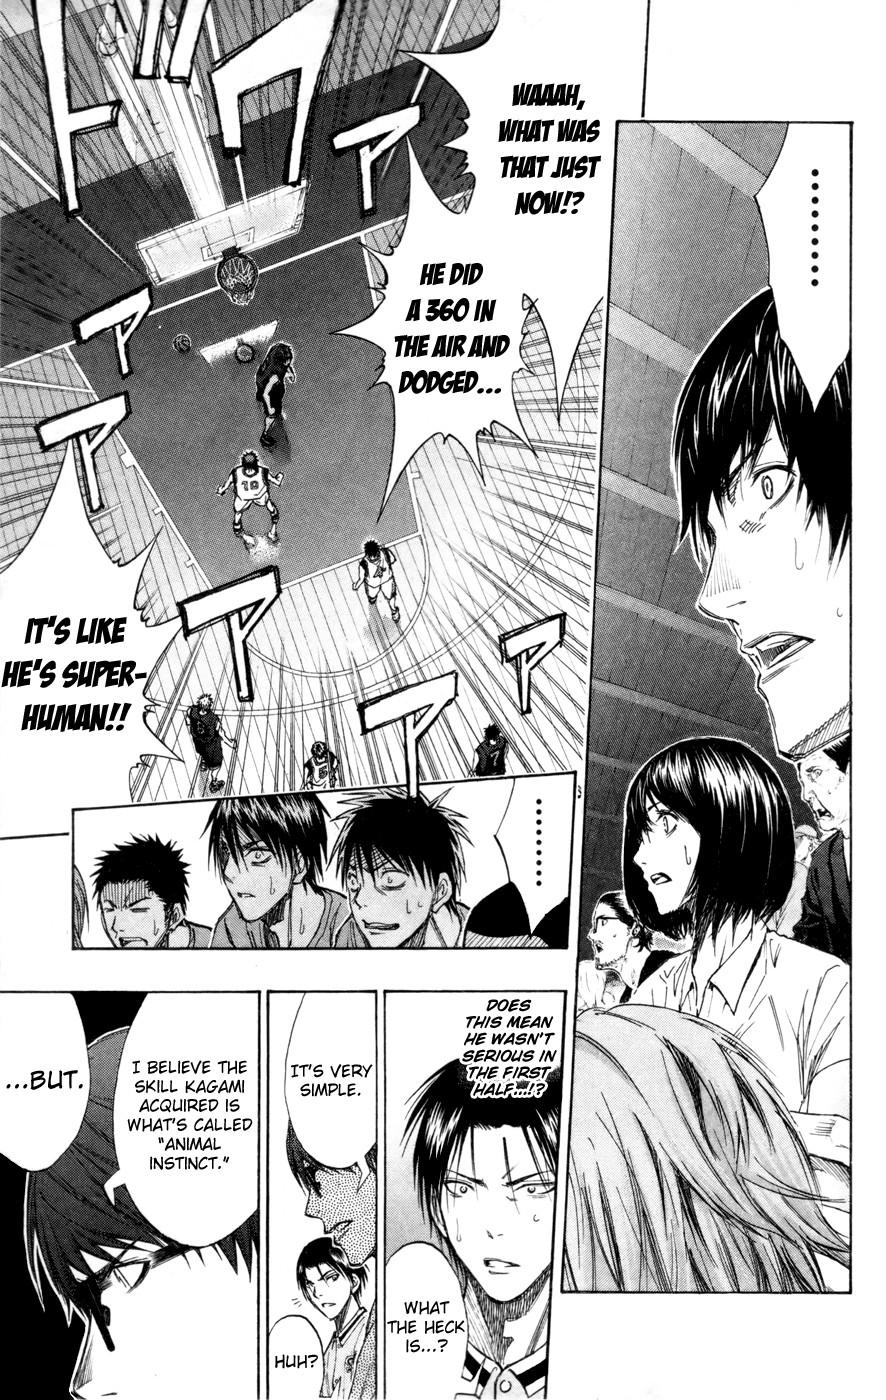 Kuroko no Basket Manga Chapter 127 - Image 17